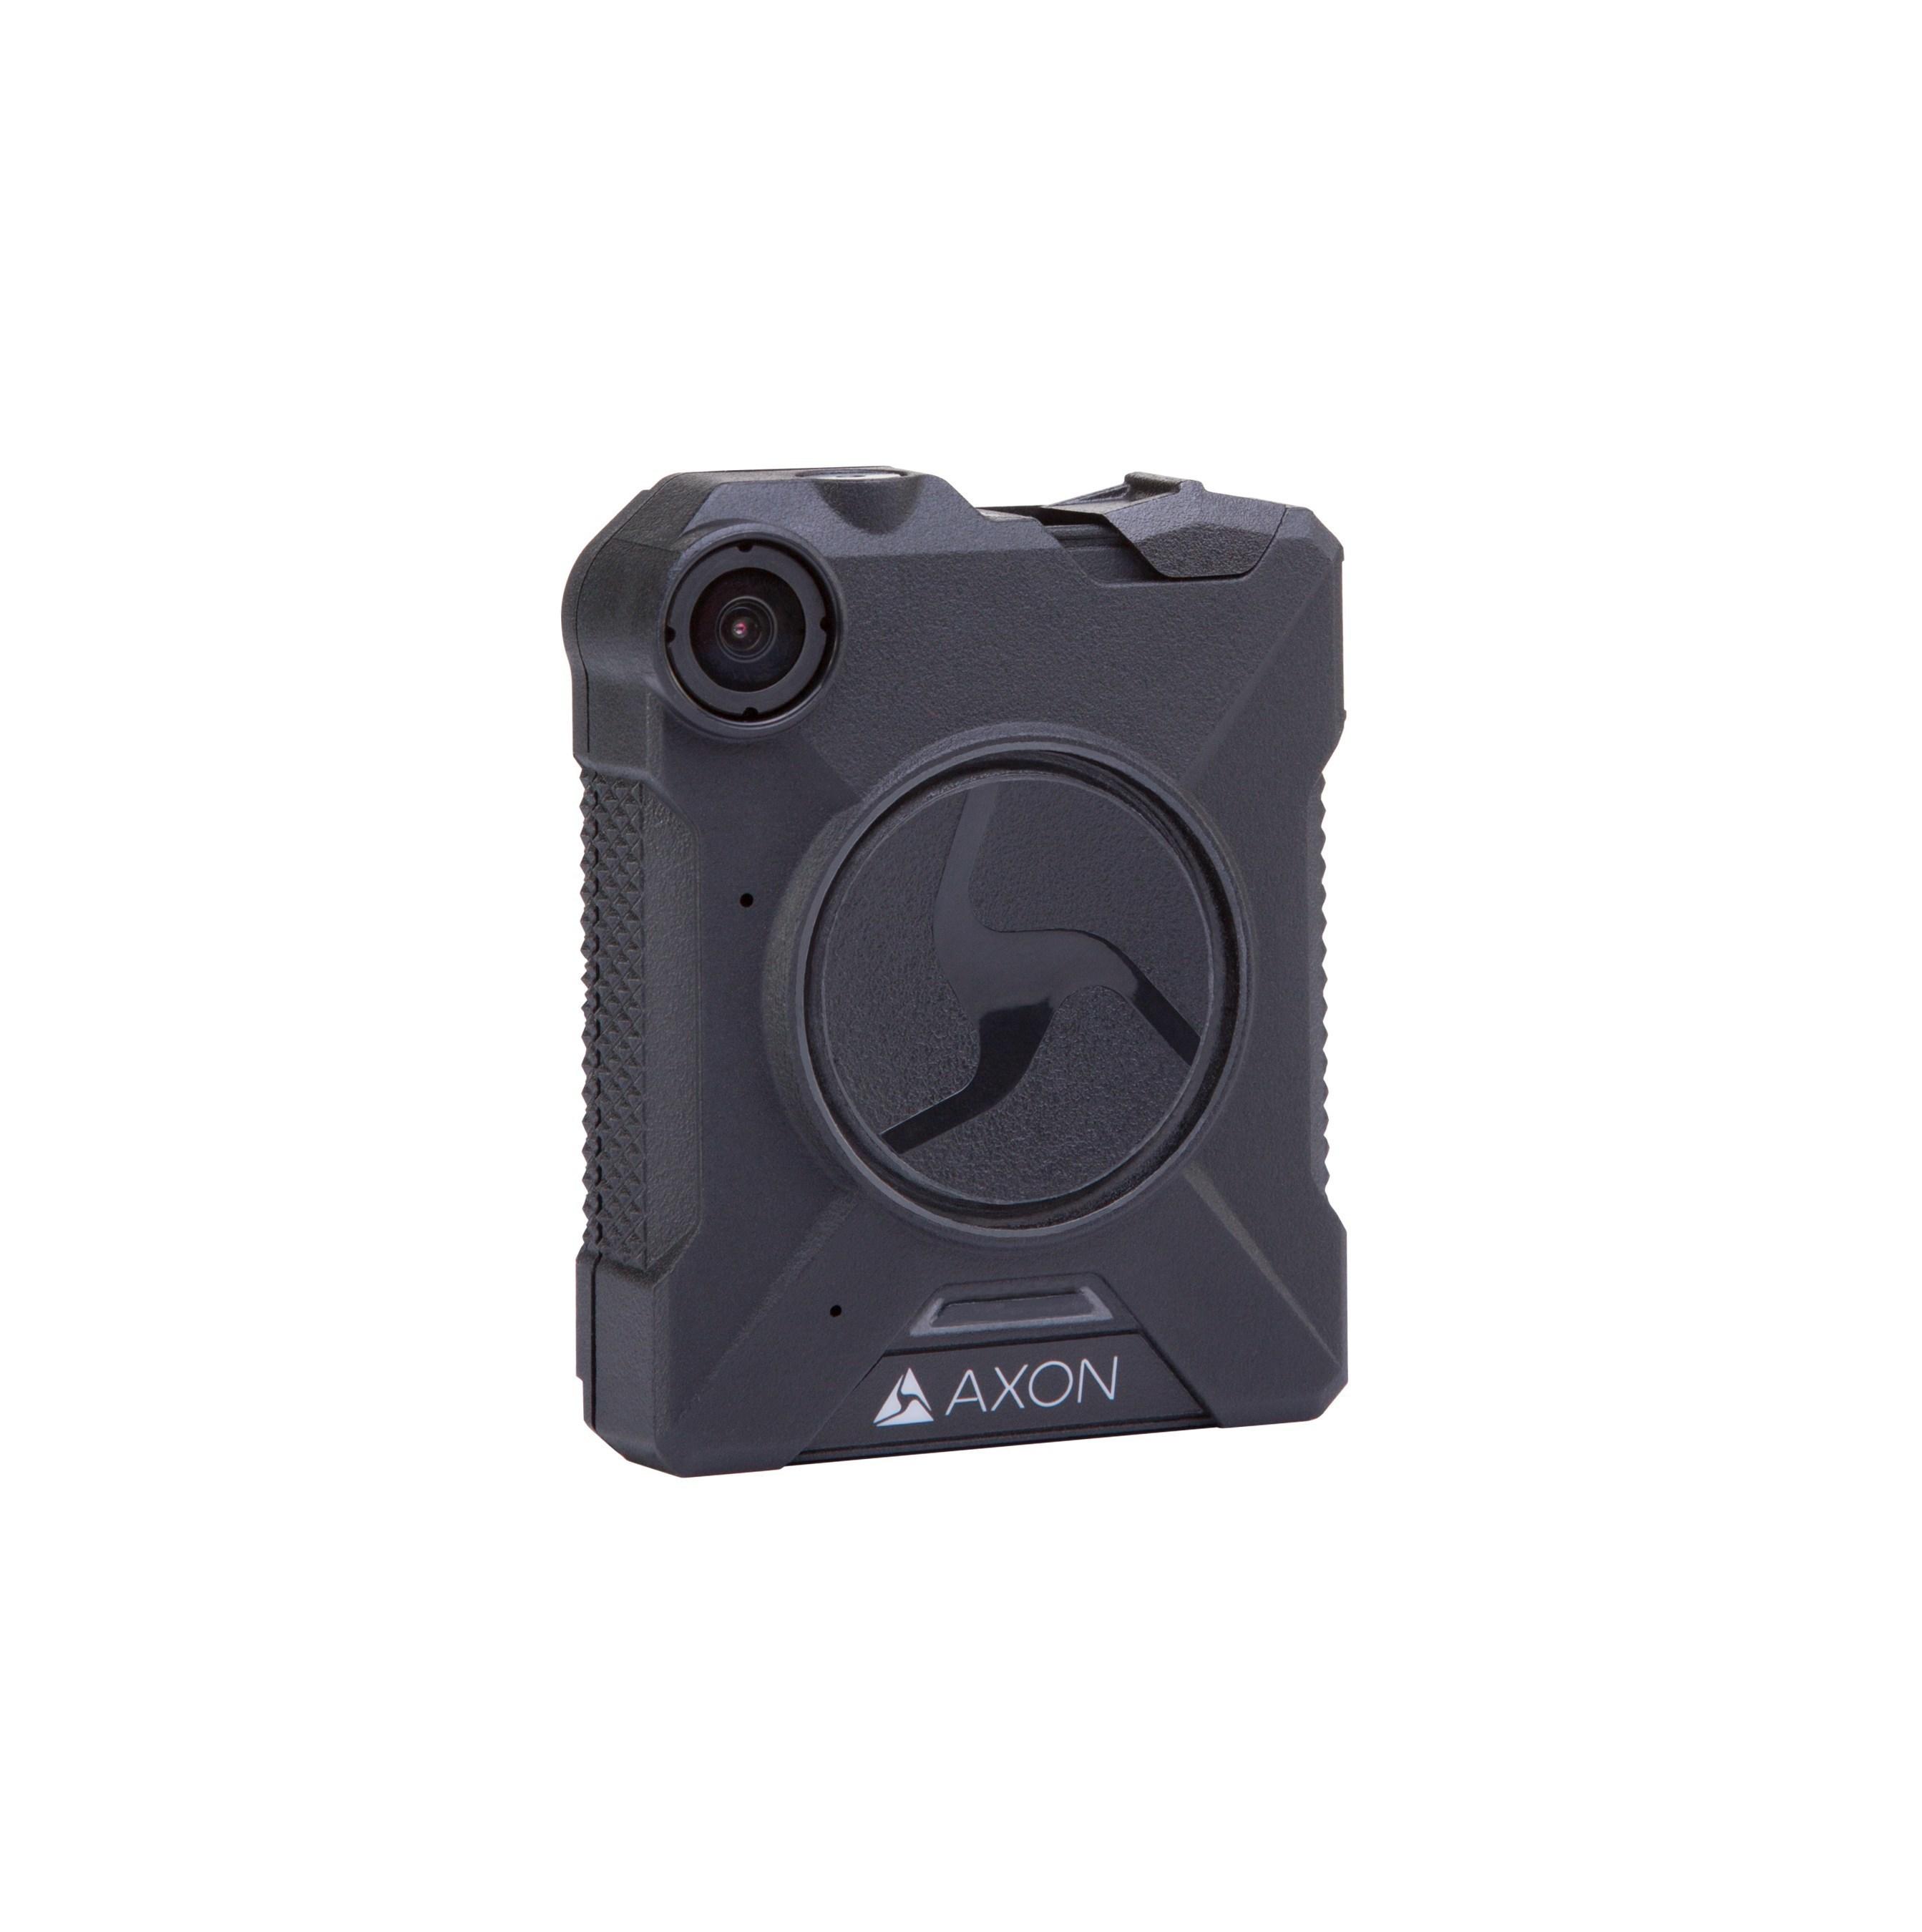 TASER's Axon Body 2 On-Officer Camera